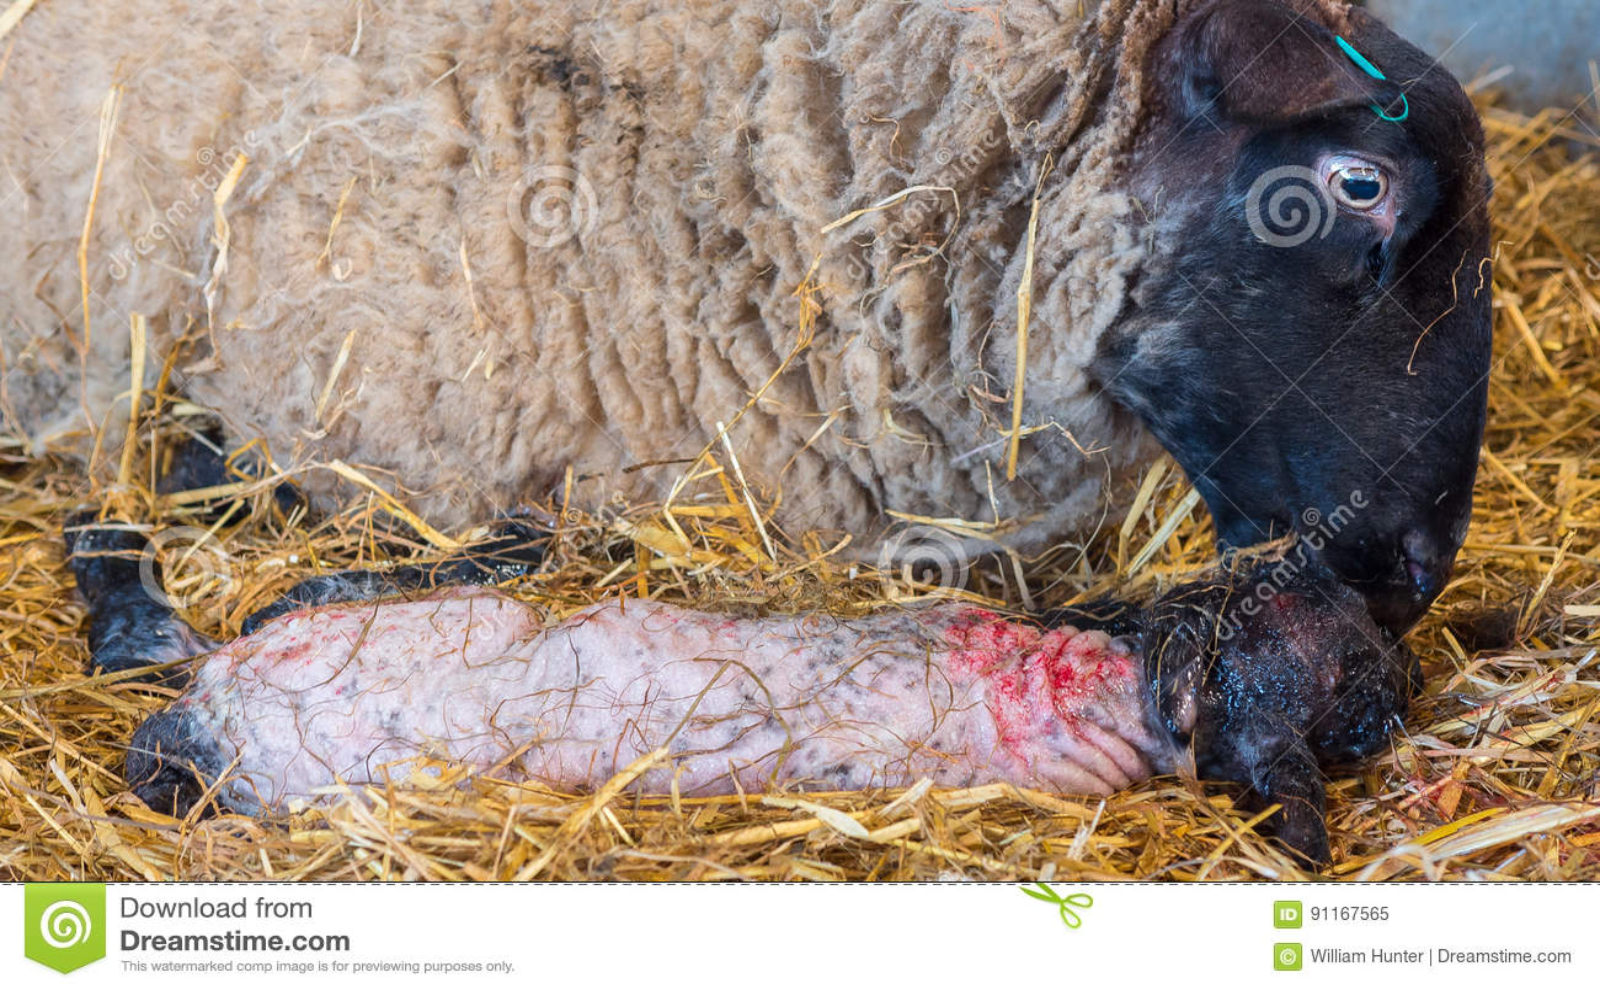 Sheep ewe licks her lamb after giving birth